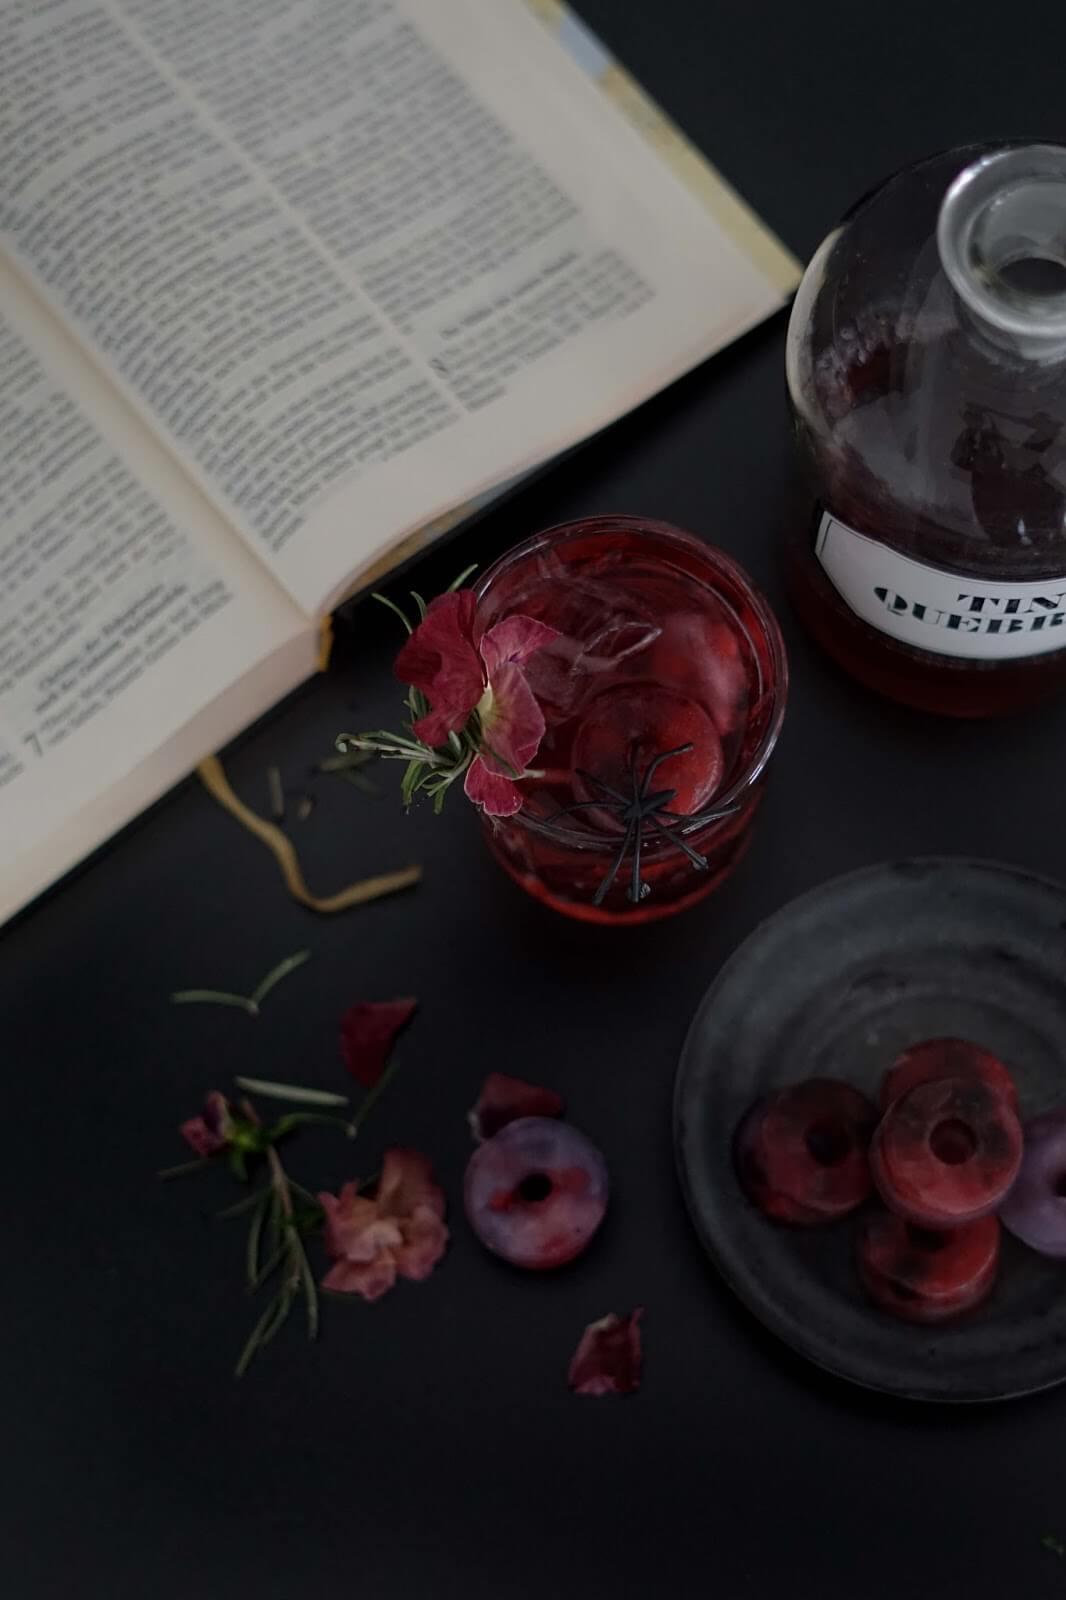 DIY Blog Stilreich Dekoart - Cocktailrezept Halloweeen - Spooky Drink mixen